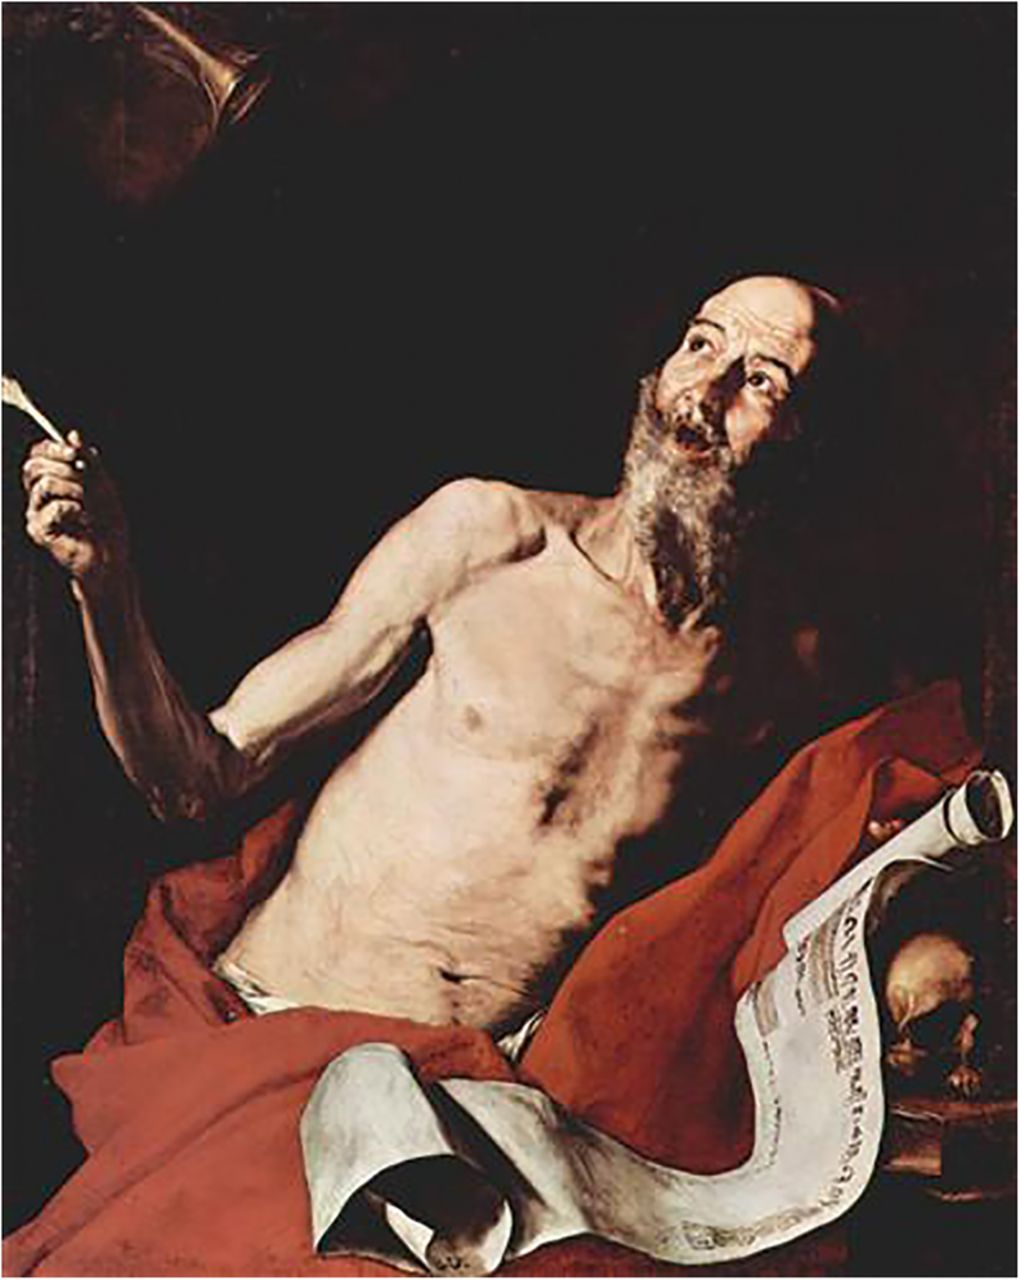 Jusepe de Ribera painting of a man with pectus excavatum